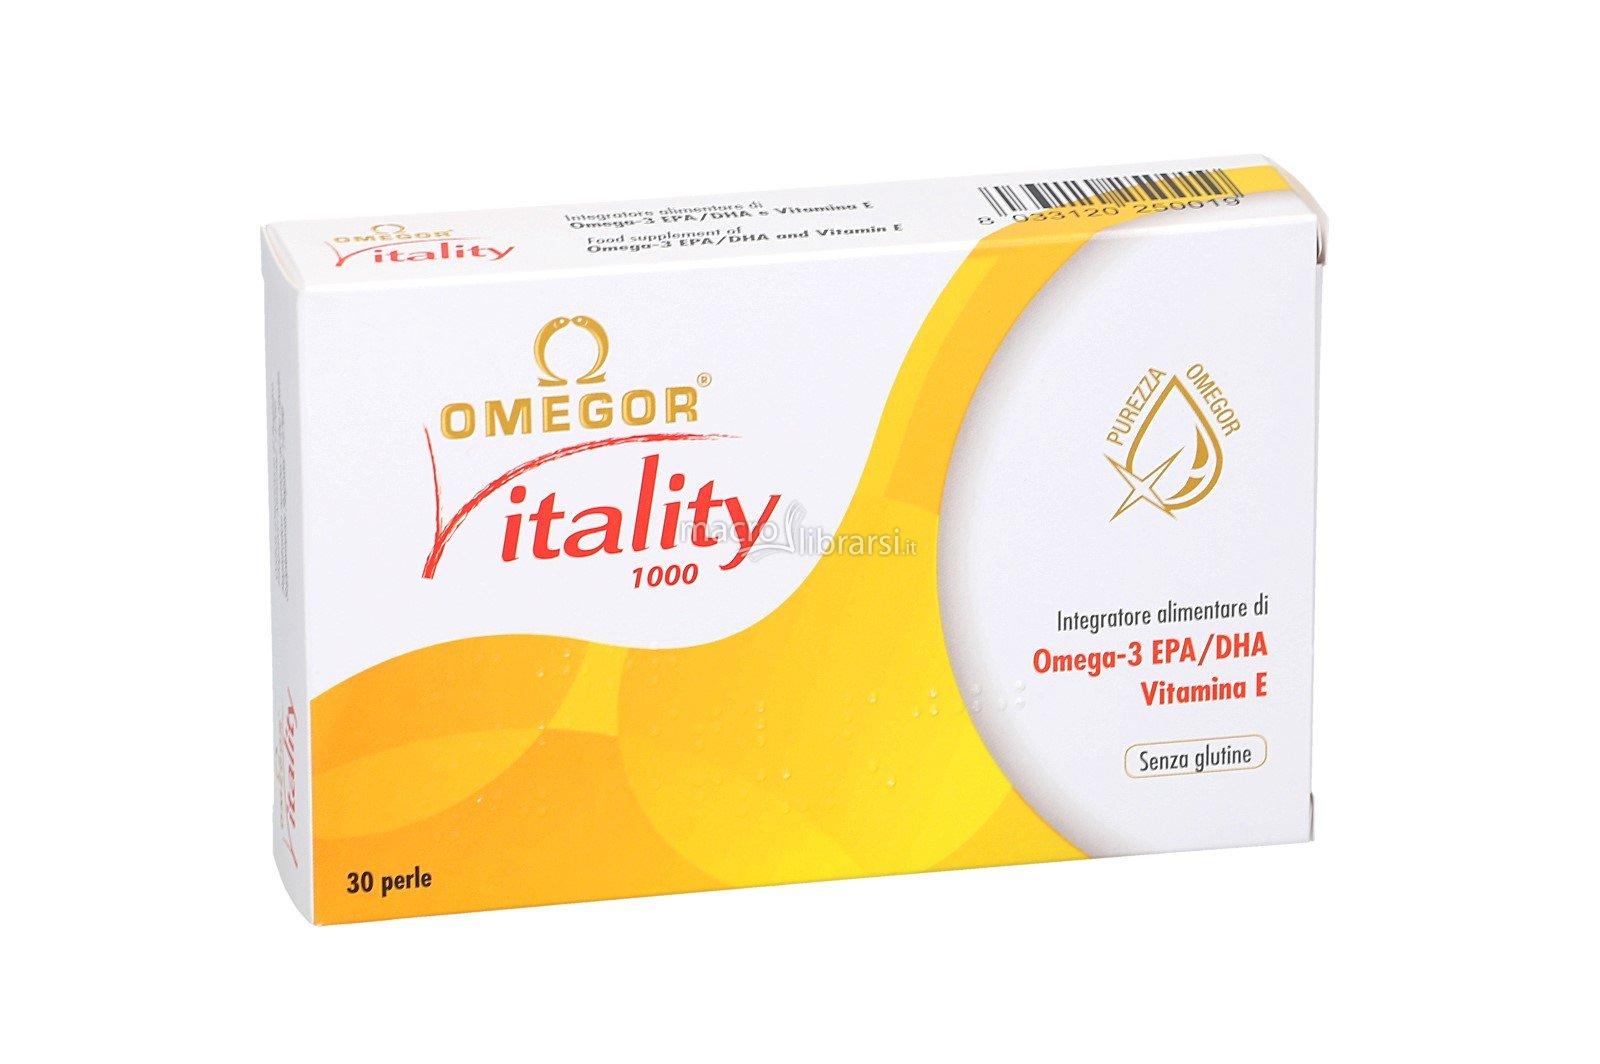 Omegor® Vitality 1000 - 30 perle da 1410 mg